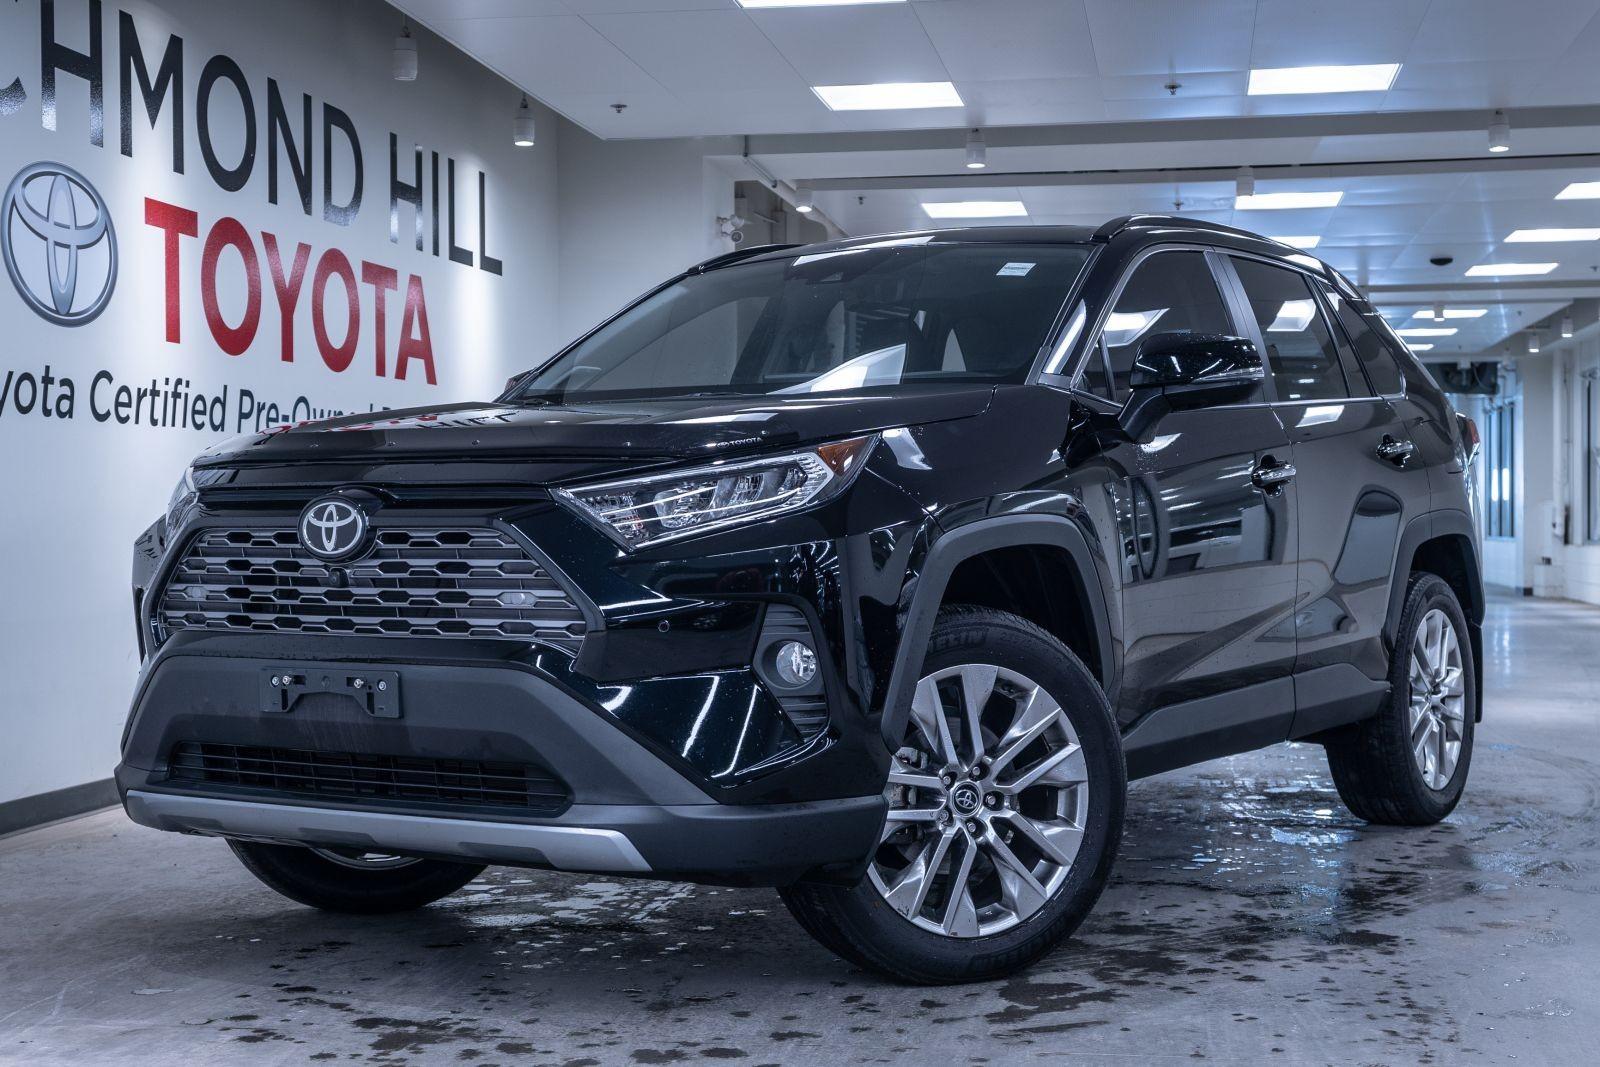 Richmond Hill Toyota | Inventory